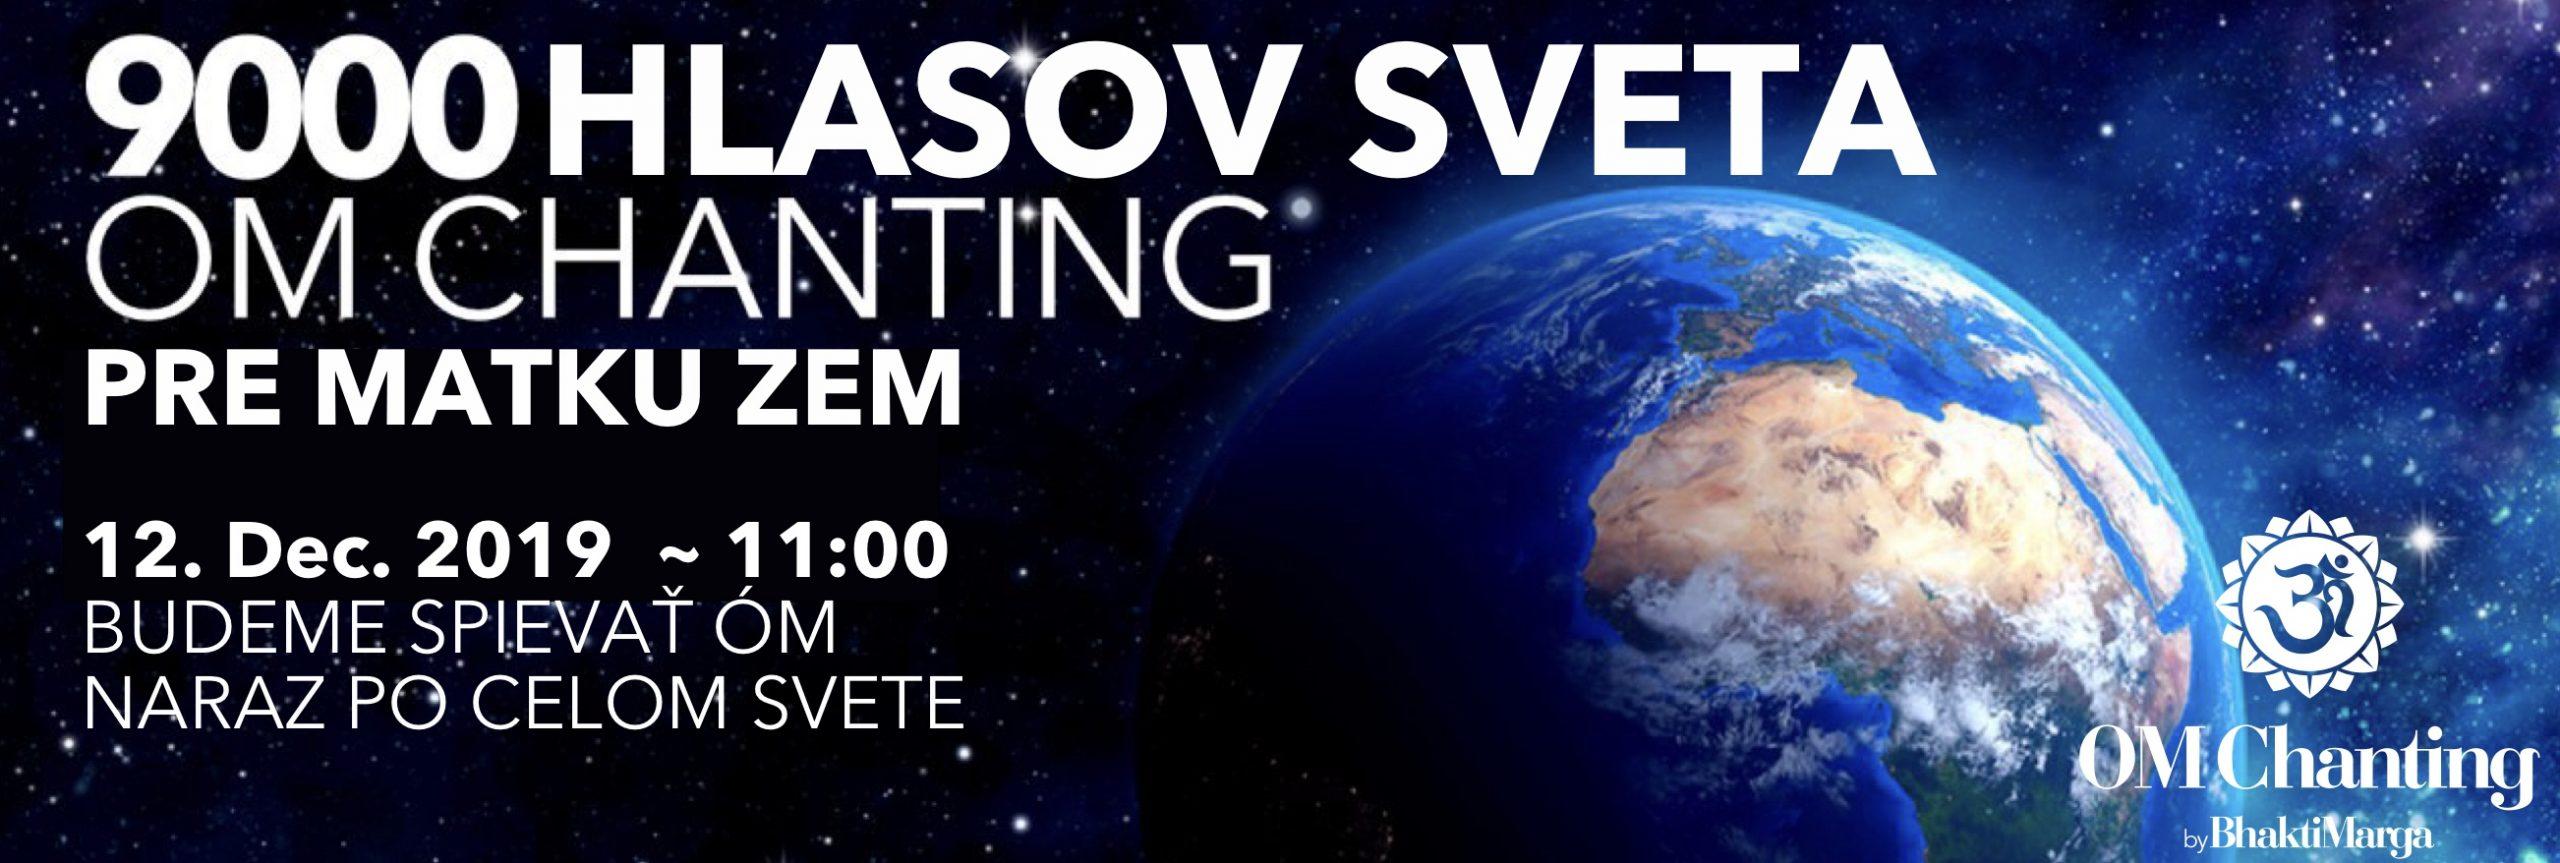 9000 Hlasov sveta - OM Chanting pre Matku Zem